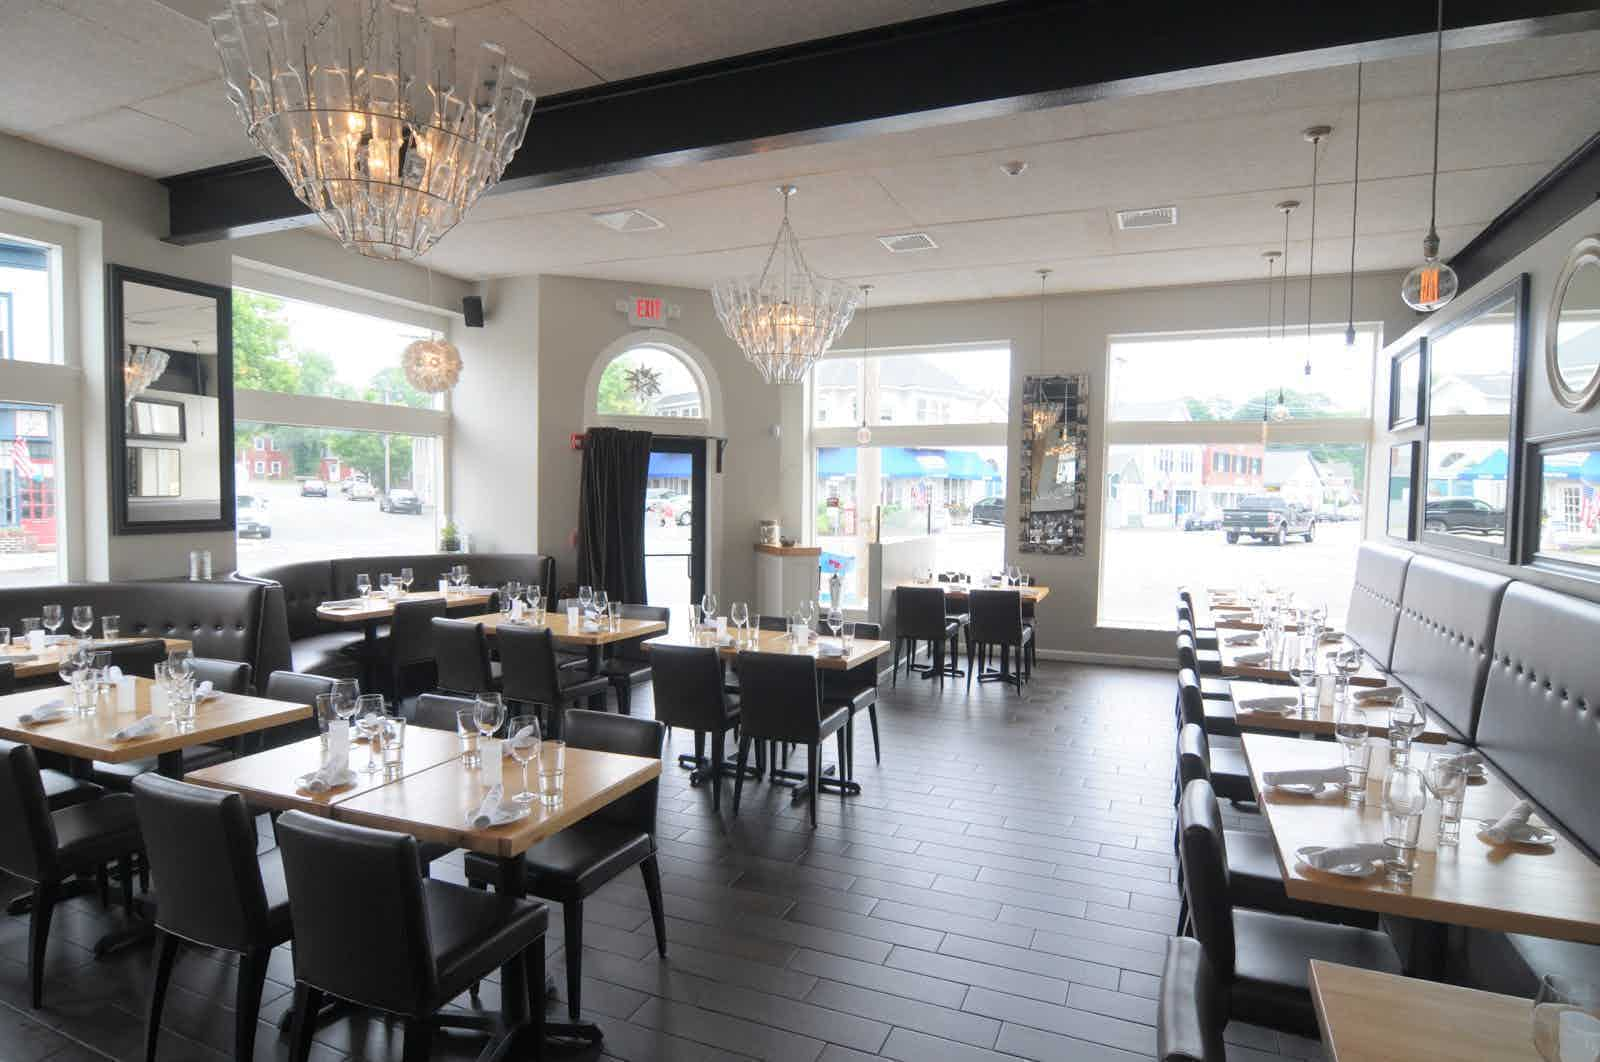 5 Corners Kitchen - Marblehead | Restaurant Review - Zagat